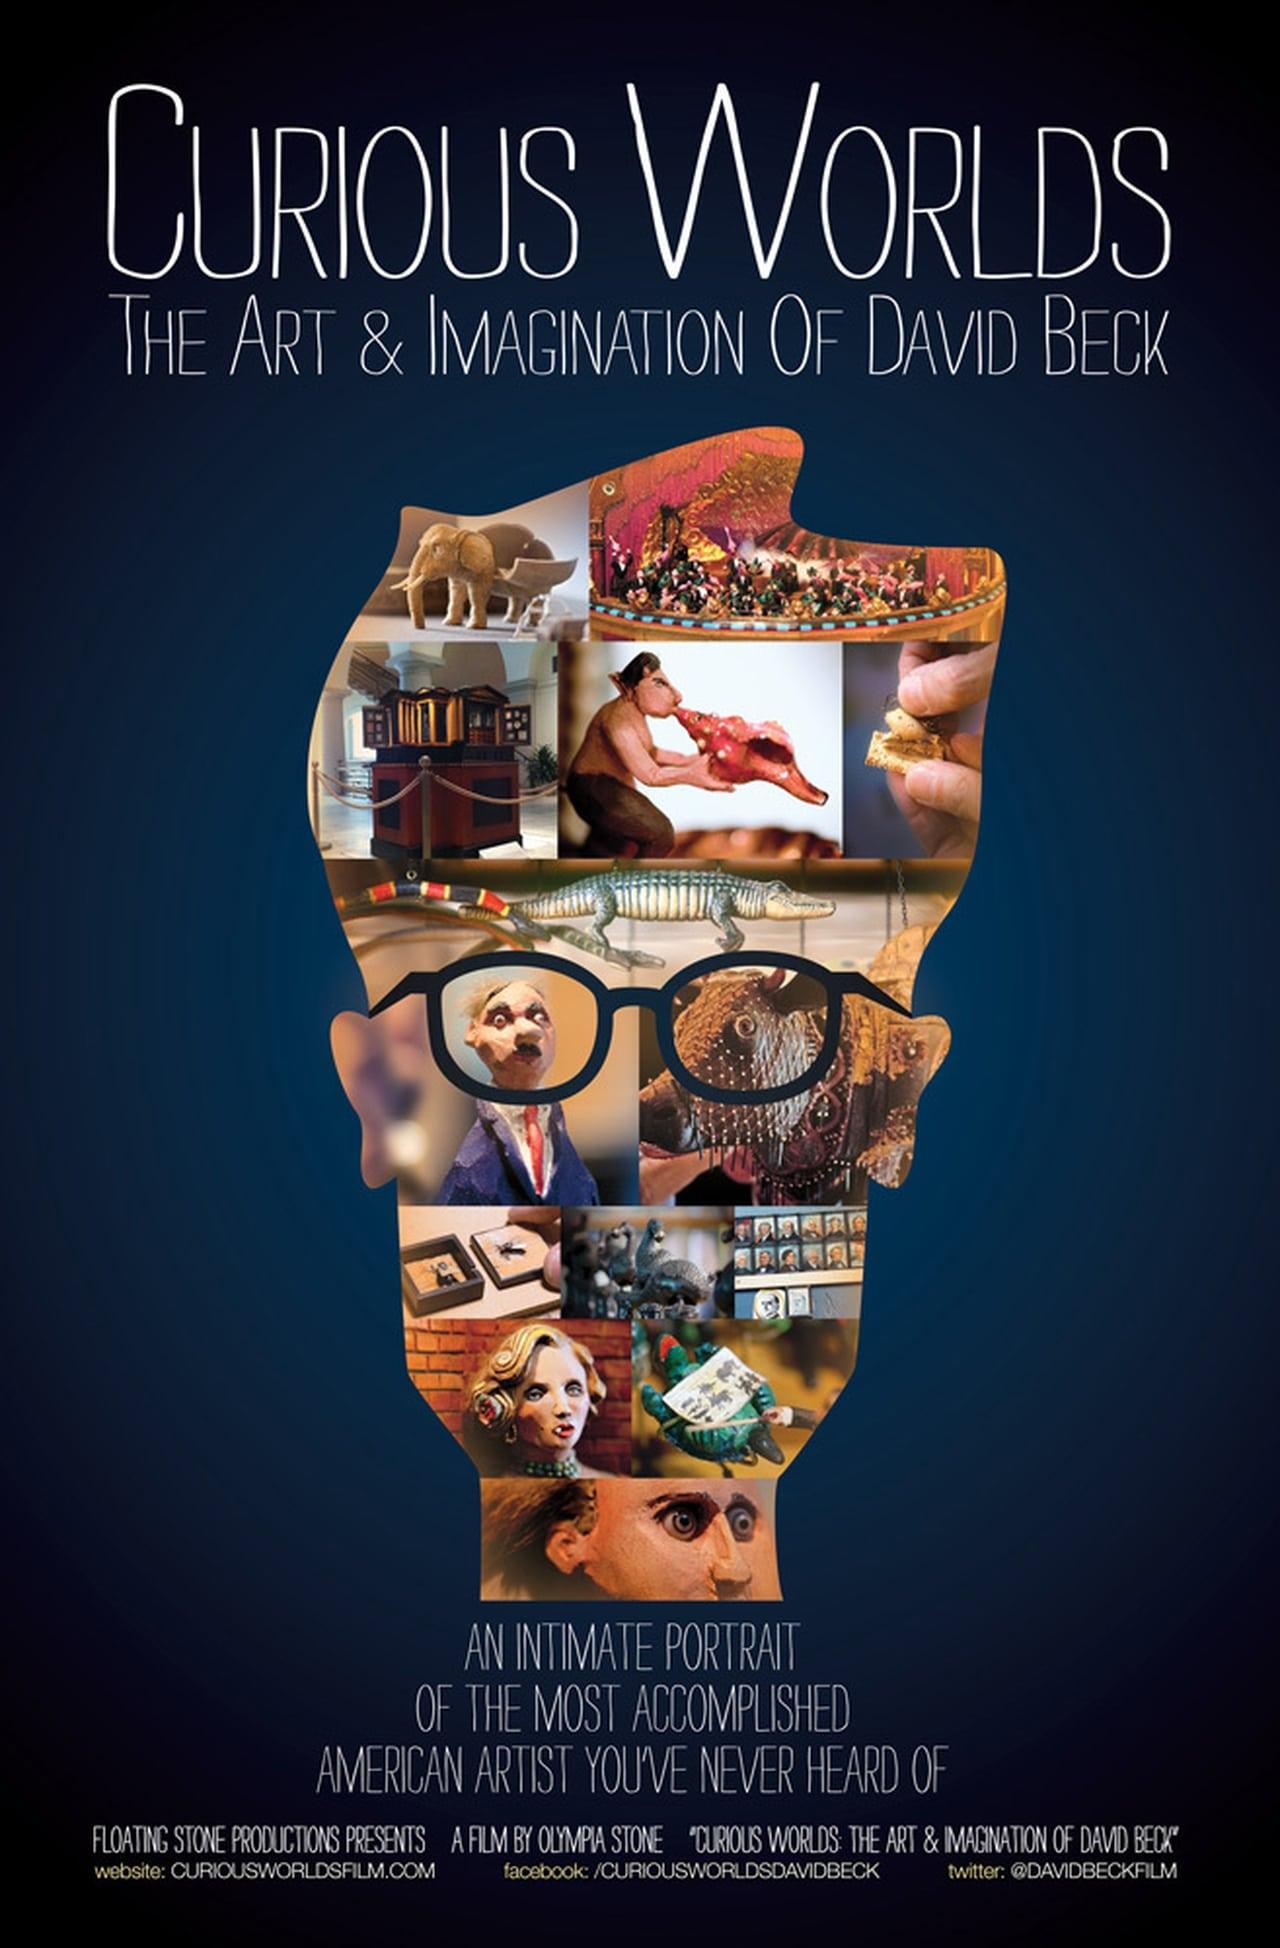 Curious Worlds: The Art & Imagination of David Beck